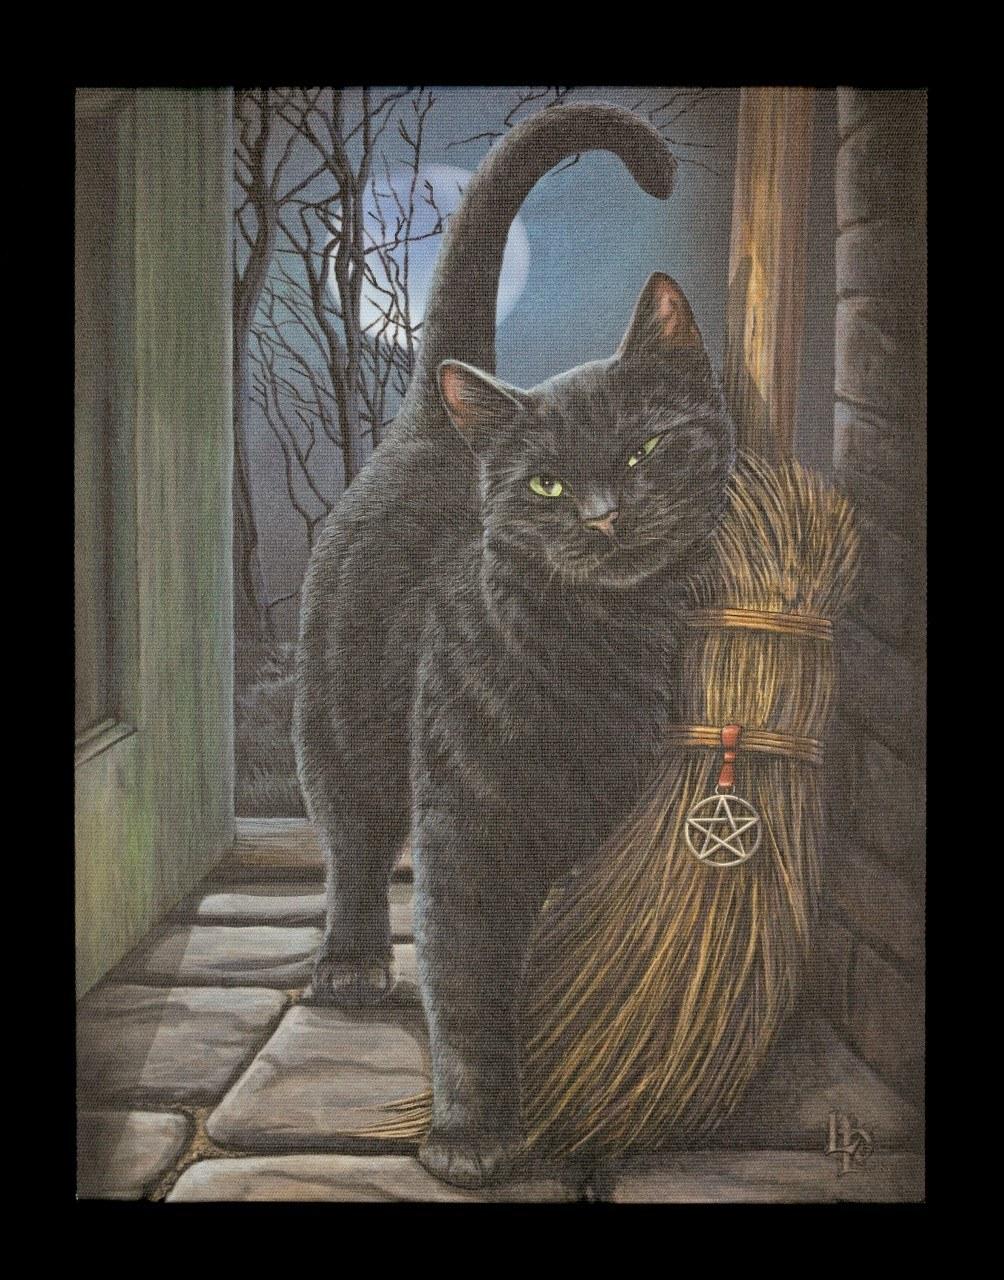 Kleine Leinwand mit Katze - Brush with Magic